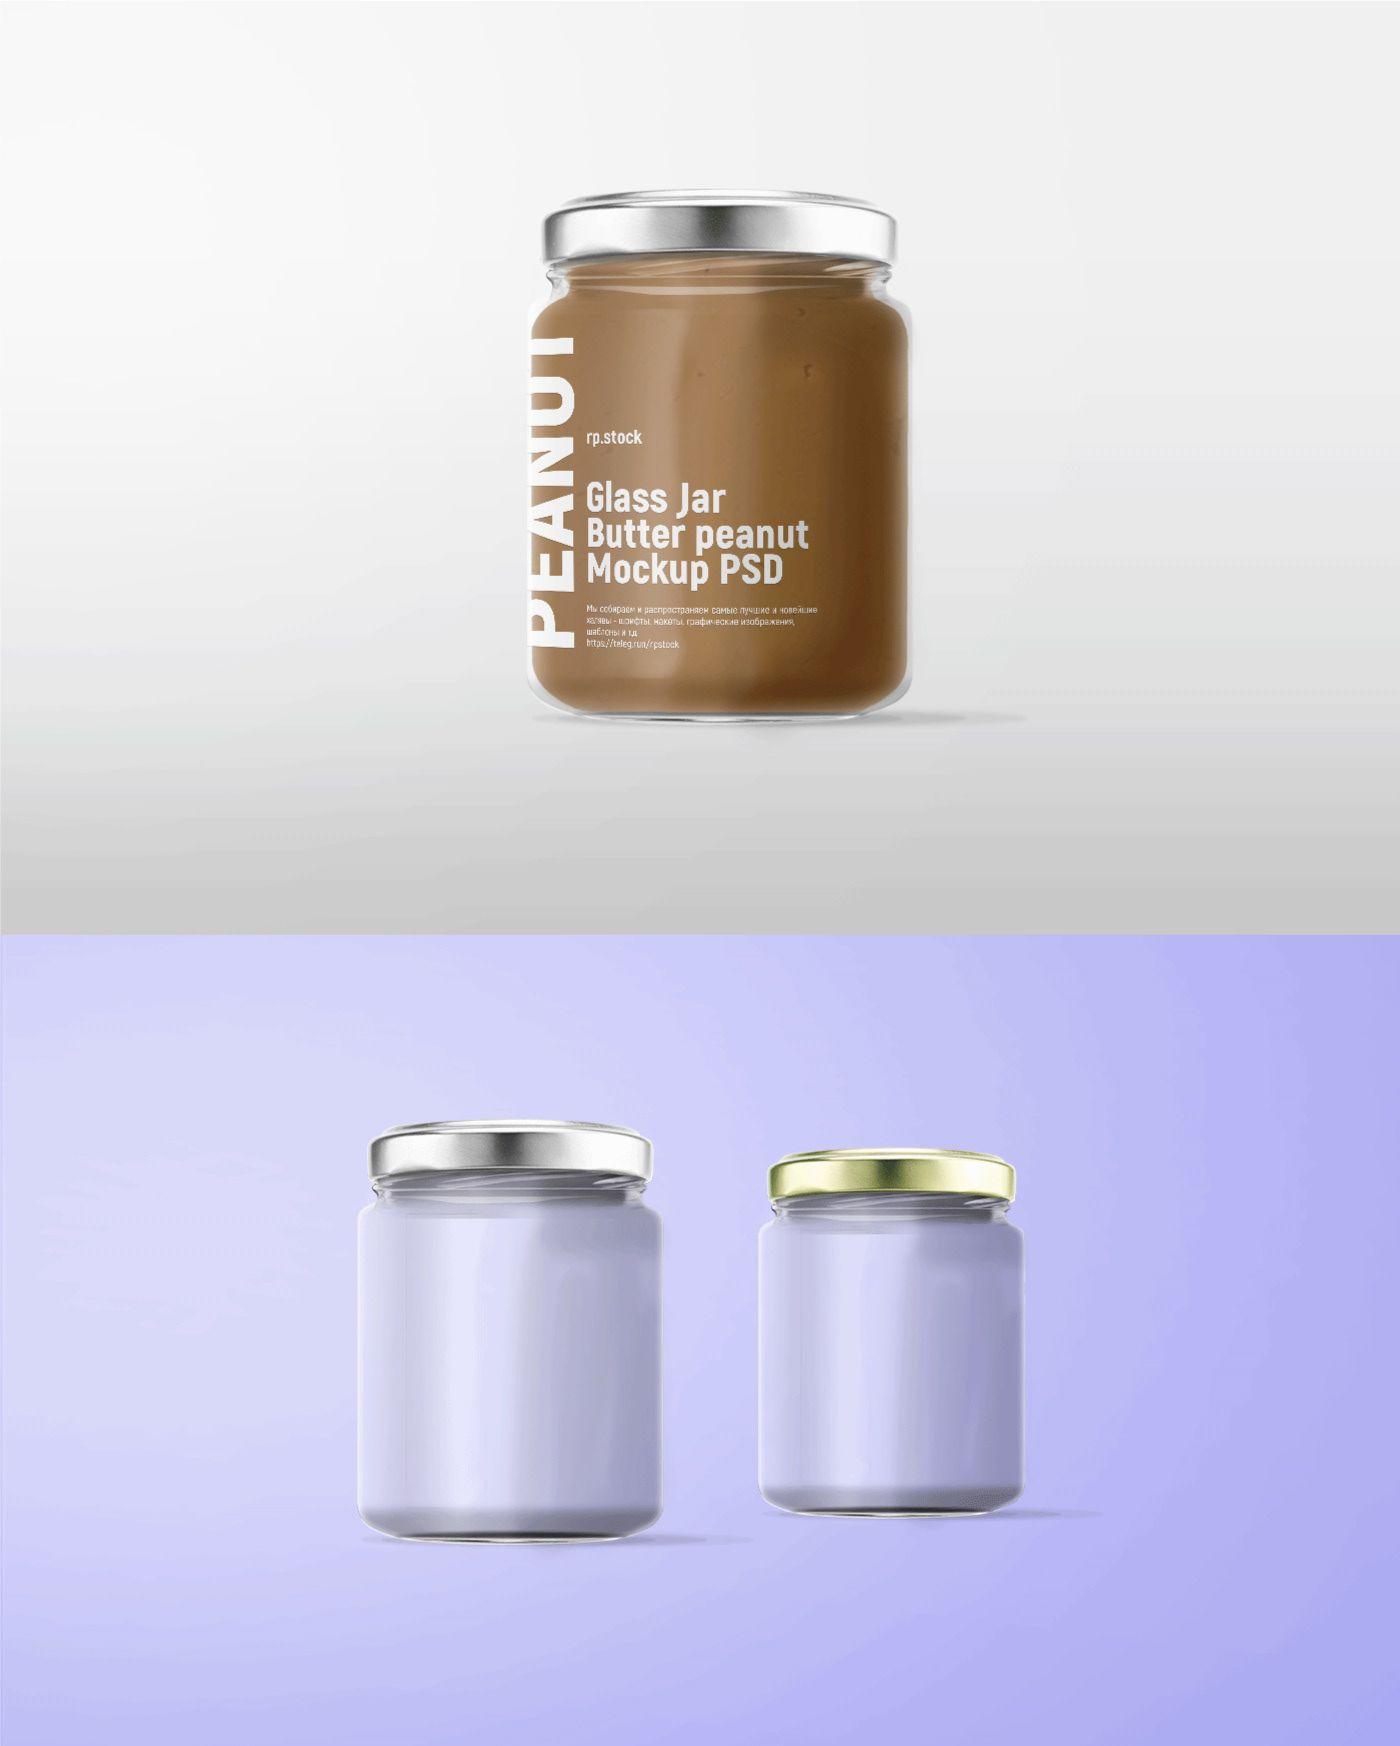 Free Realistic Glass Jar Mockup On Behance Glass Jars Bottle Mockup Jar